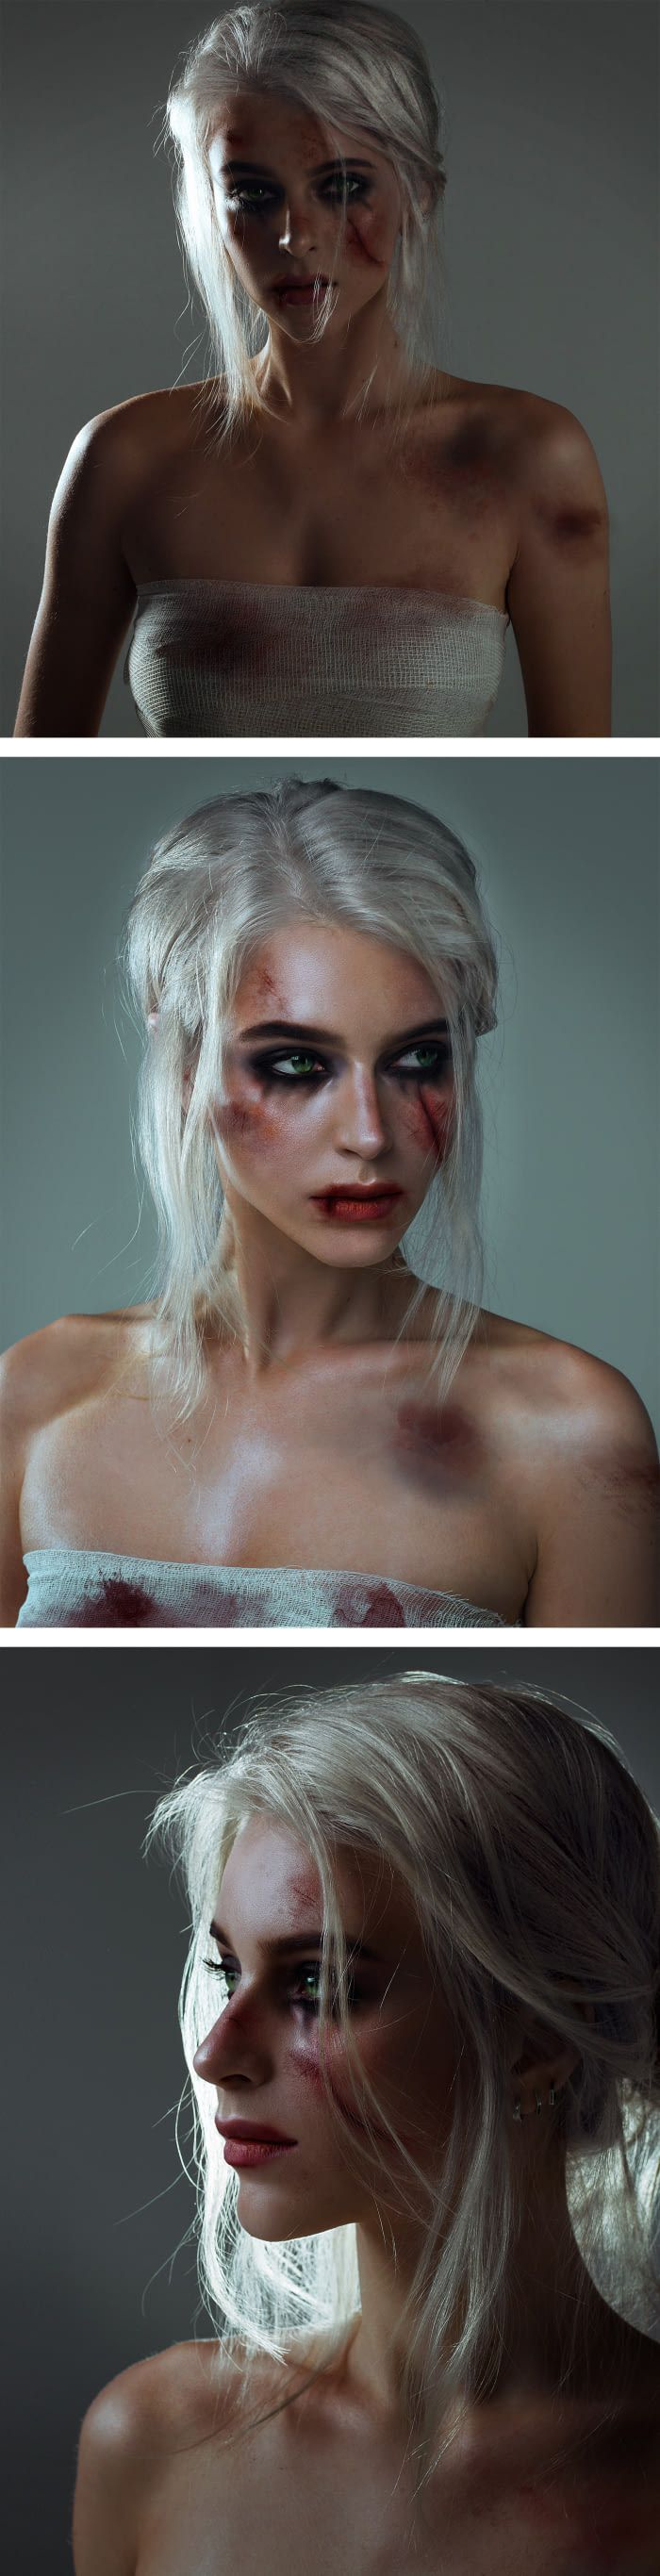 Ciri cosplay [Witcher]